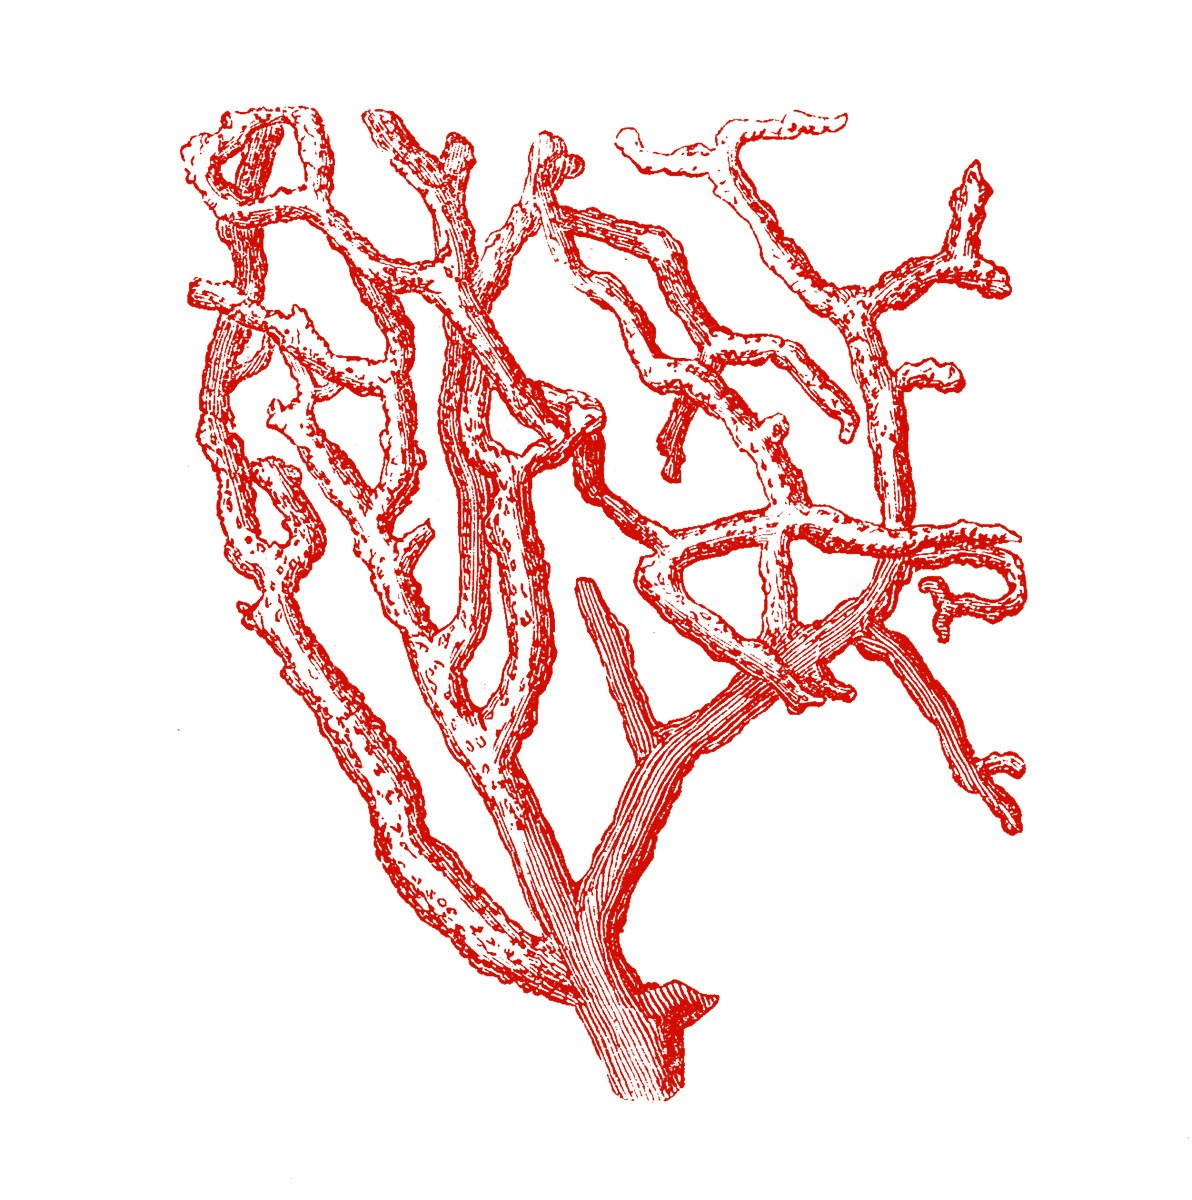 Coral Specimens